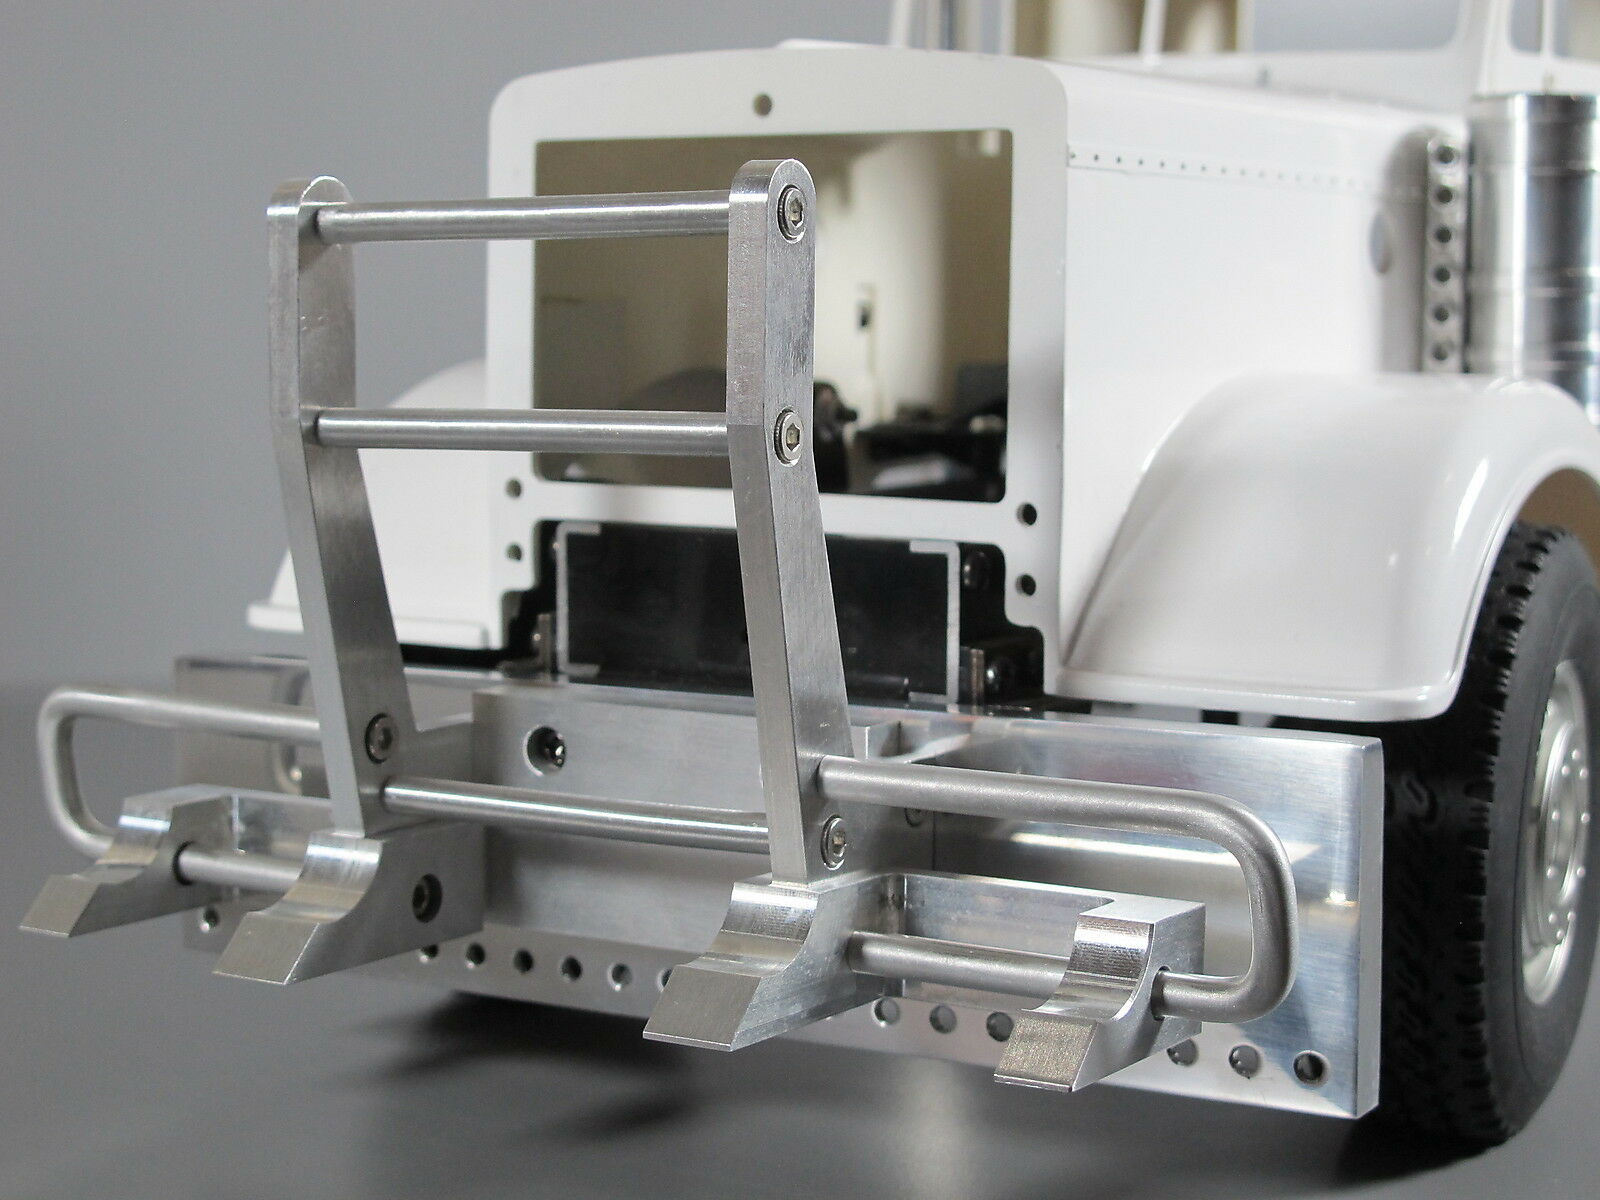 Gancho De Aluminio Estilo C   Tope Tamiya Rc 1 14 Caballero Rey Grand Transportador Semi Camión